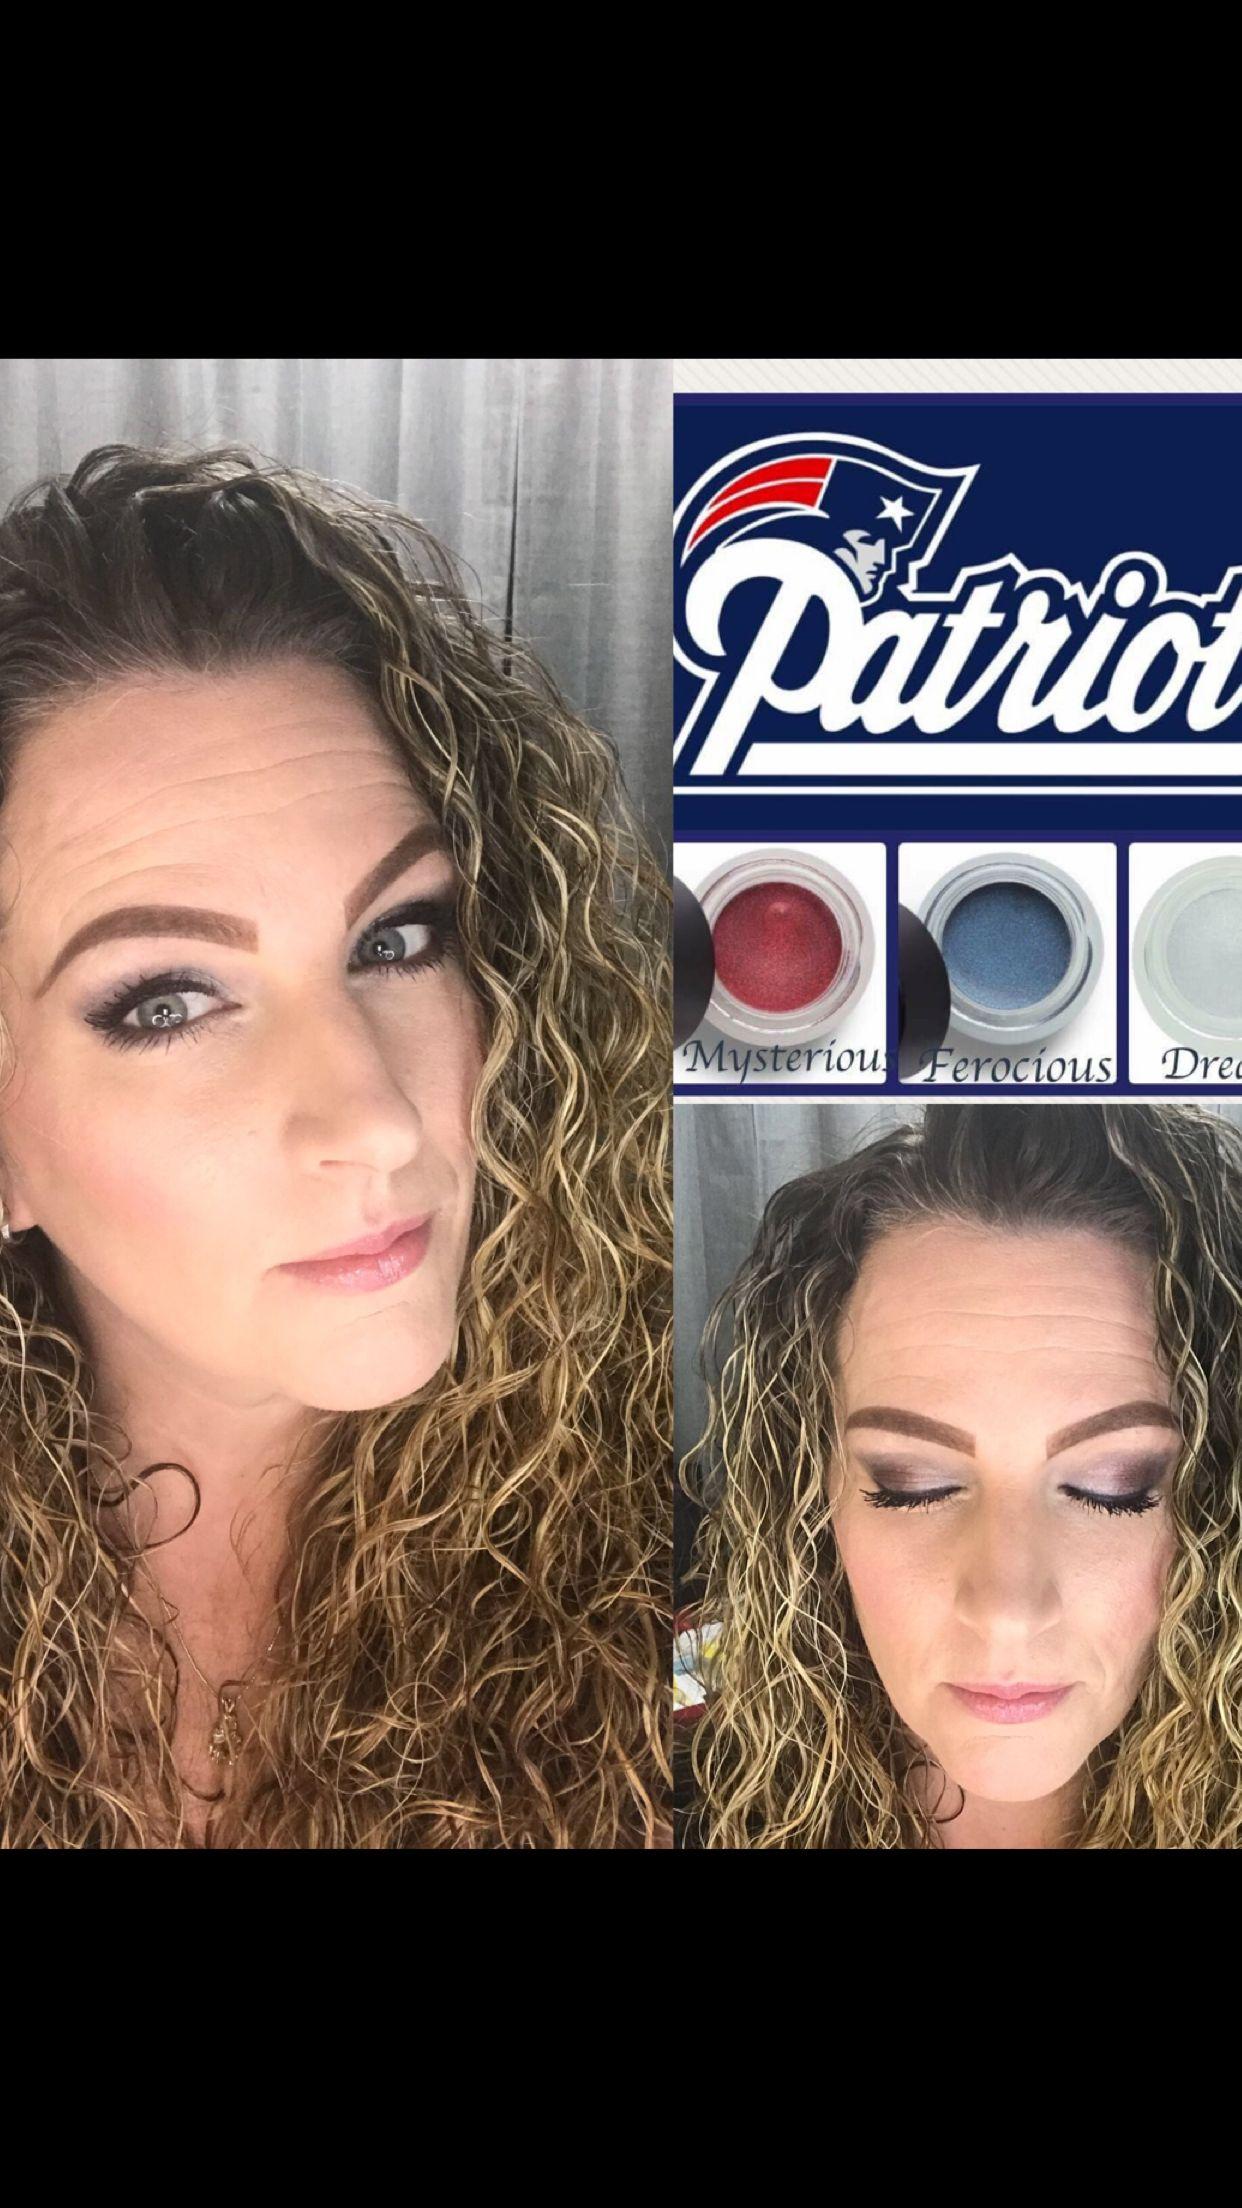 Patriot fans makeup look for the big game! Super Bowl 2018